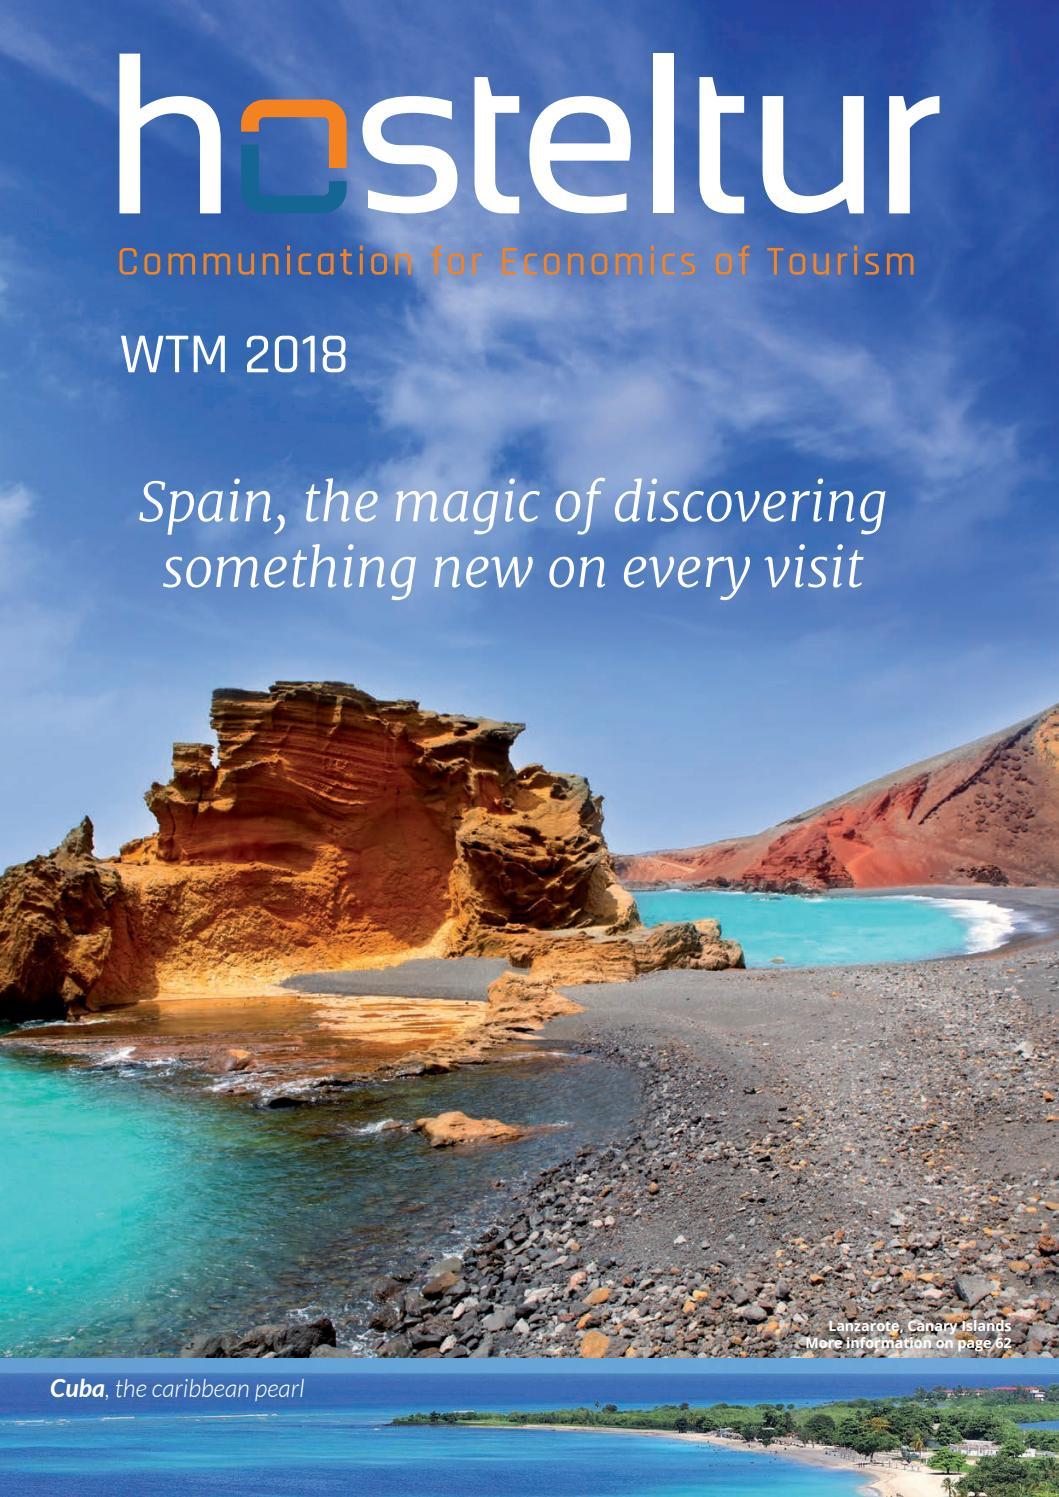 Hosteltur WTM 2018 - Spain, the magic of discovering